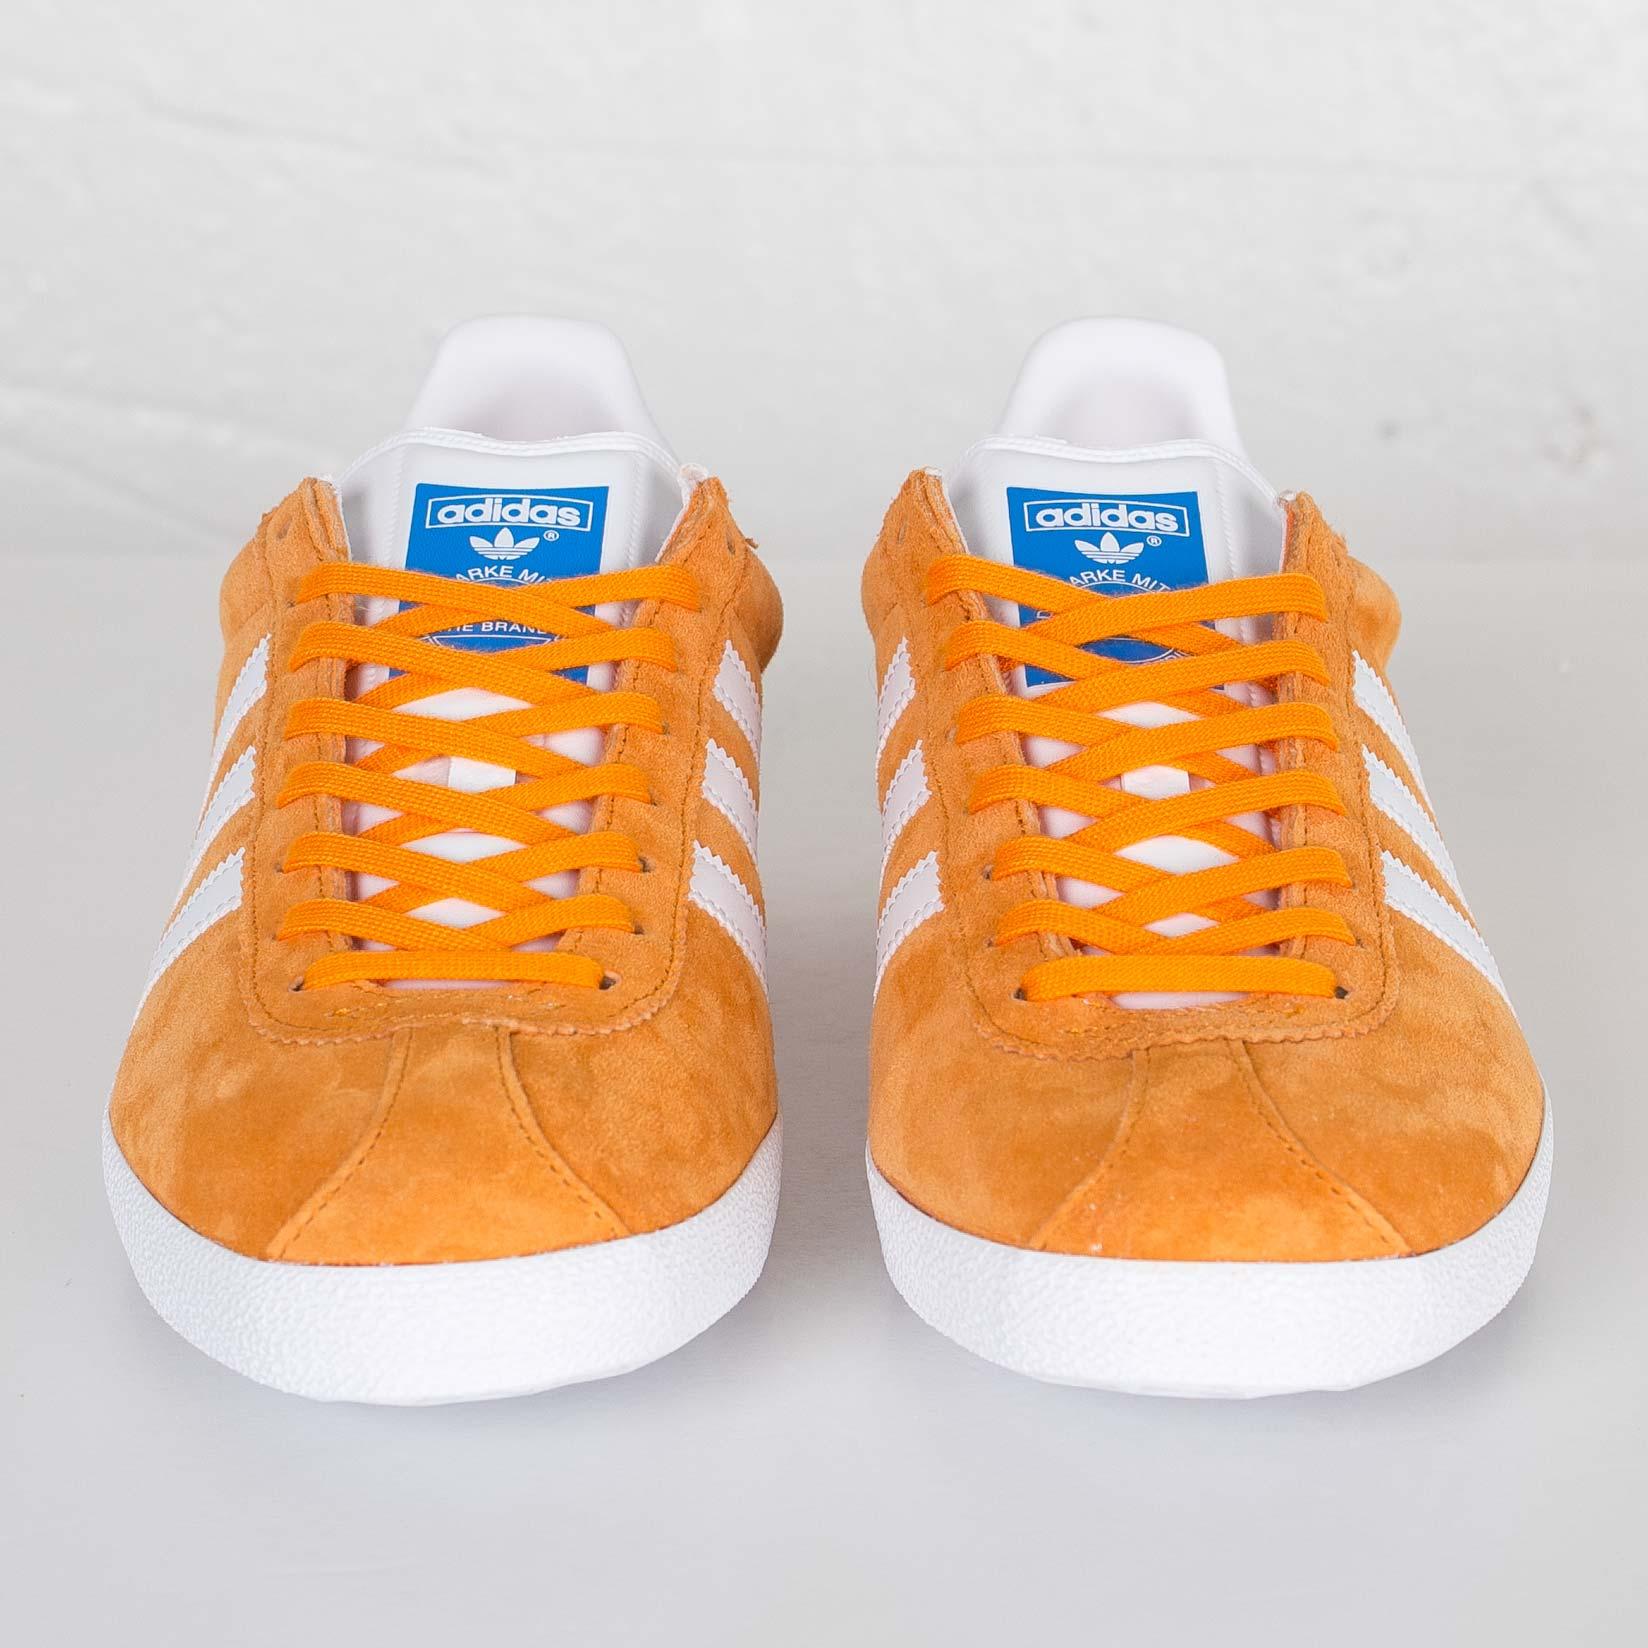 adidas Gazelle OG - S74848 - Sneakersnstuff  8d46d2db2